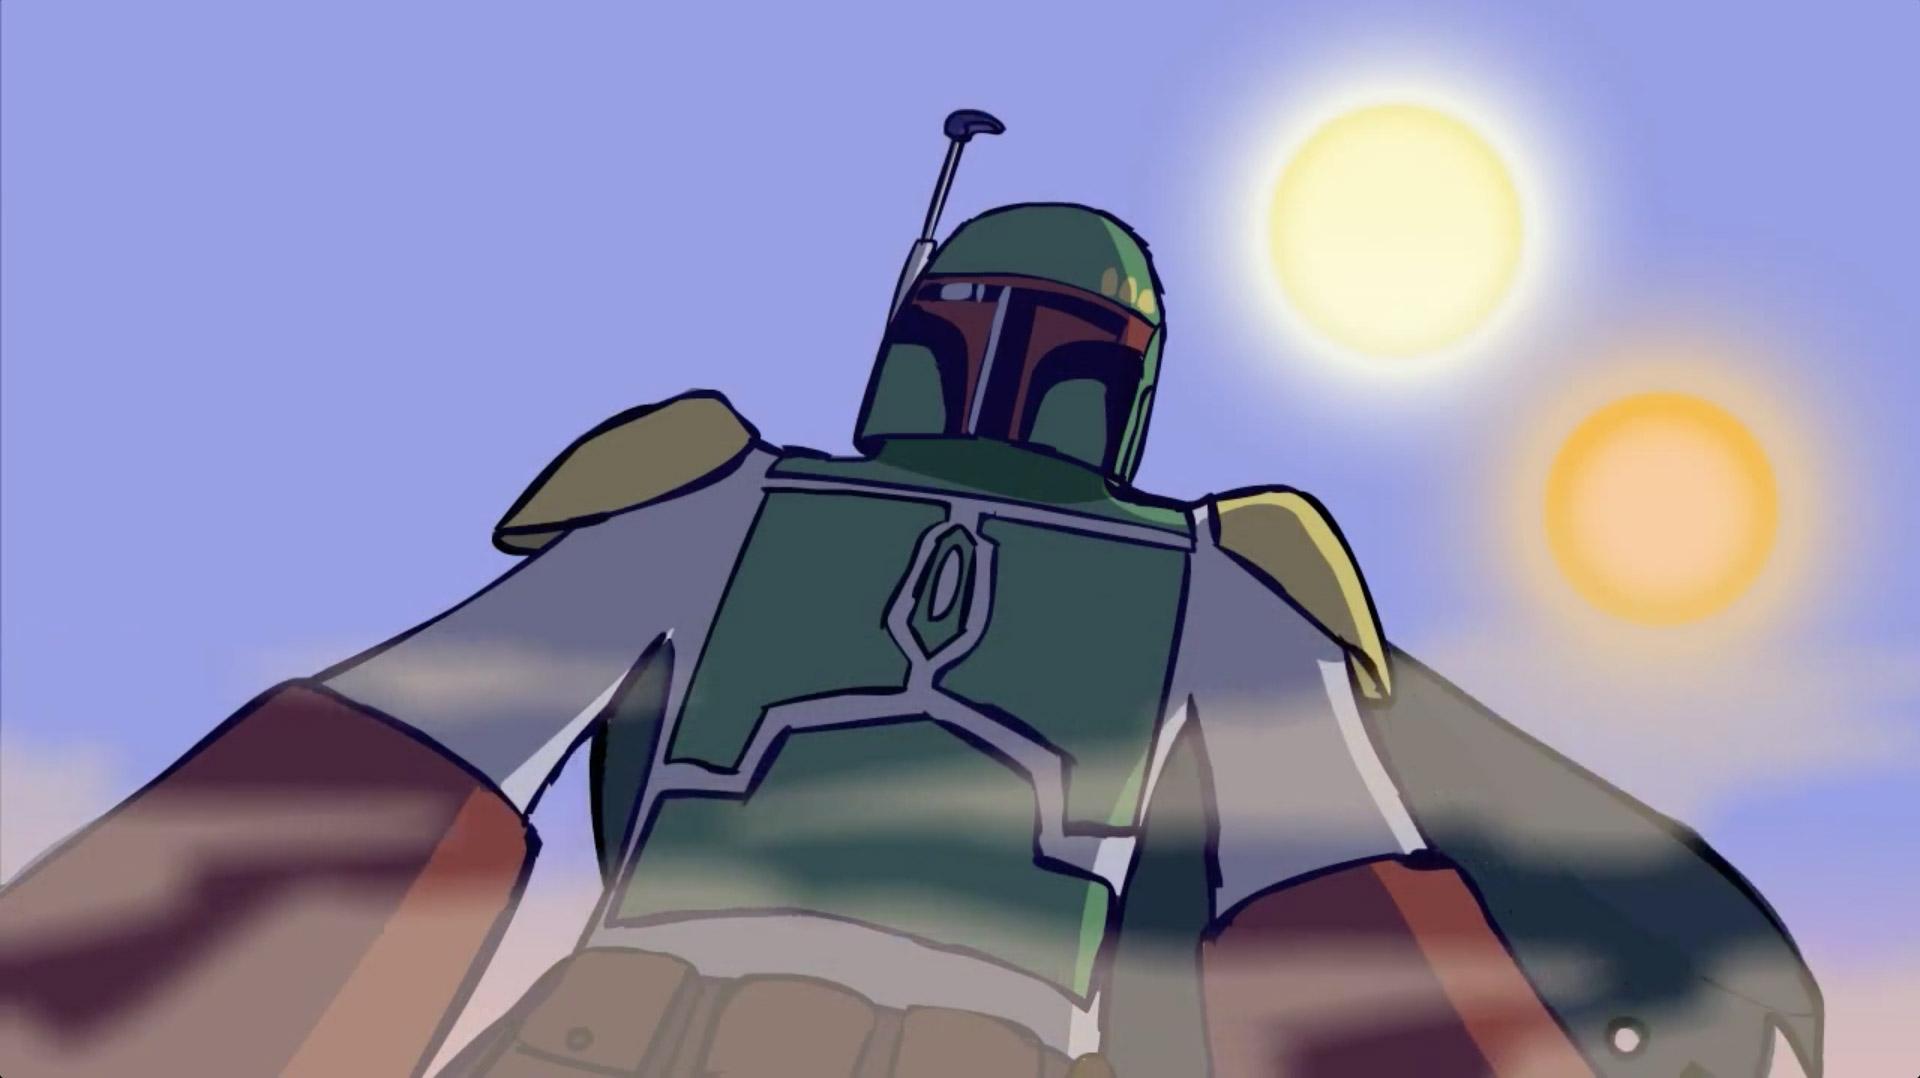 patton-oswalts-star-wars-fillbuster-gets-animated-1.jpg